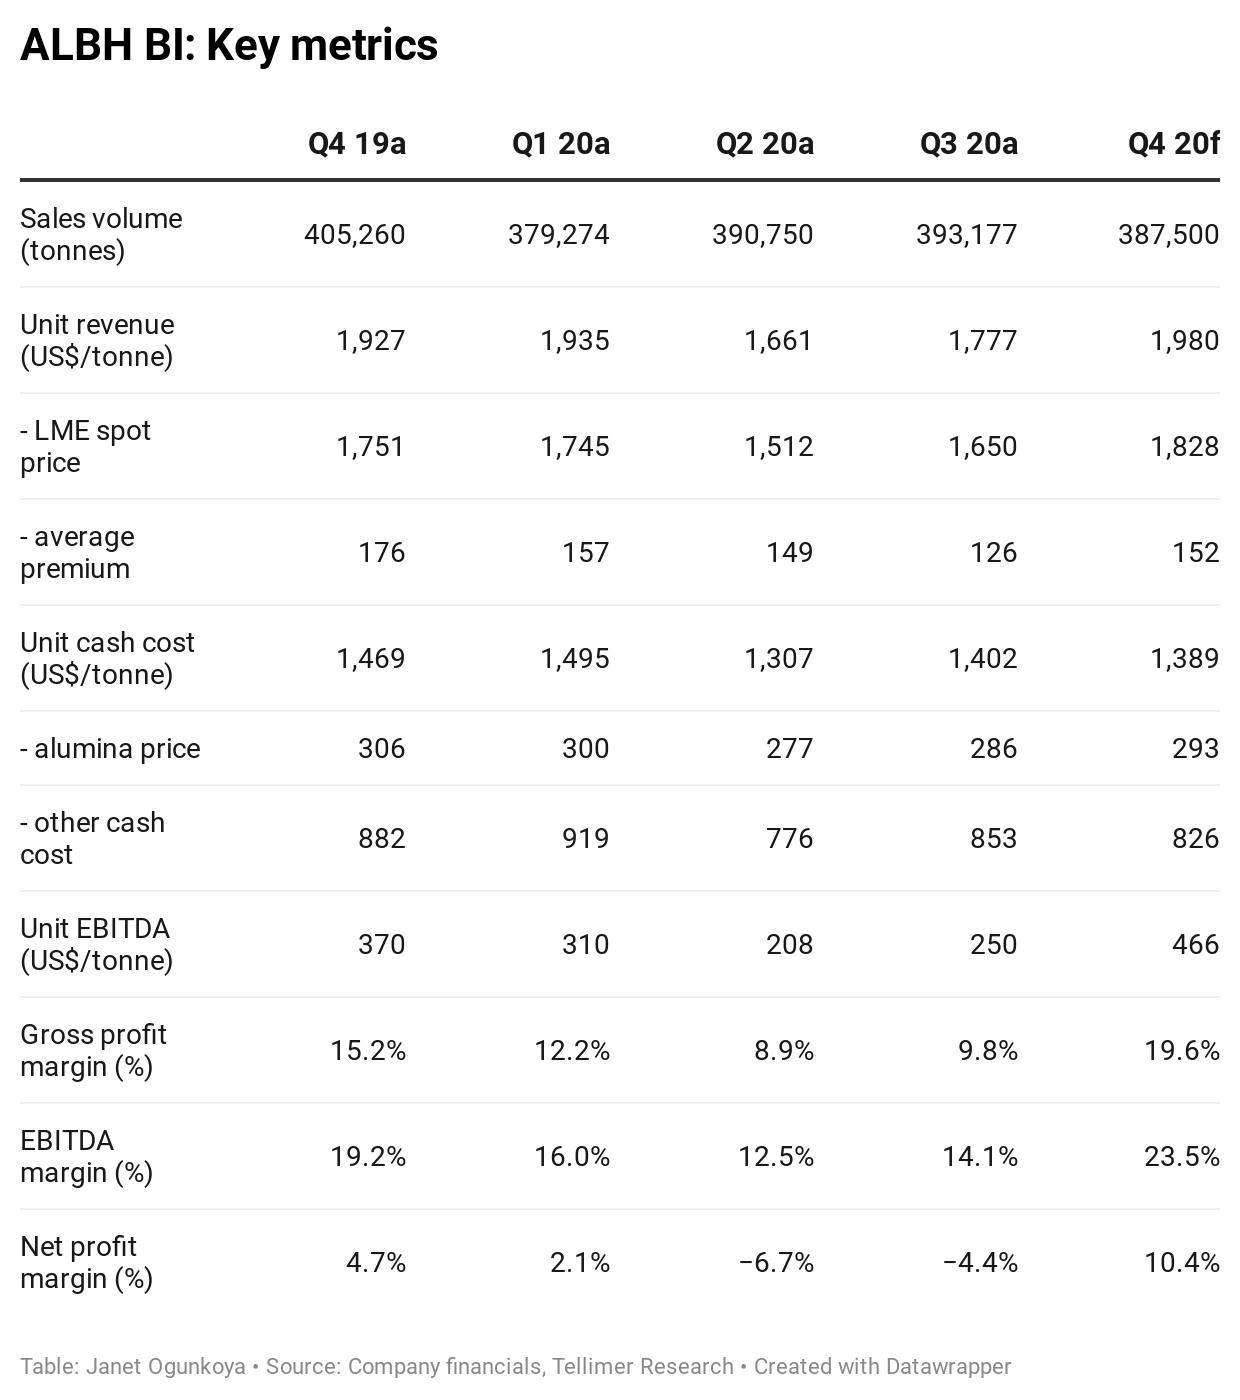 ALBH BI: Key metrics